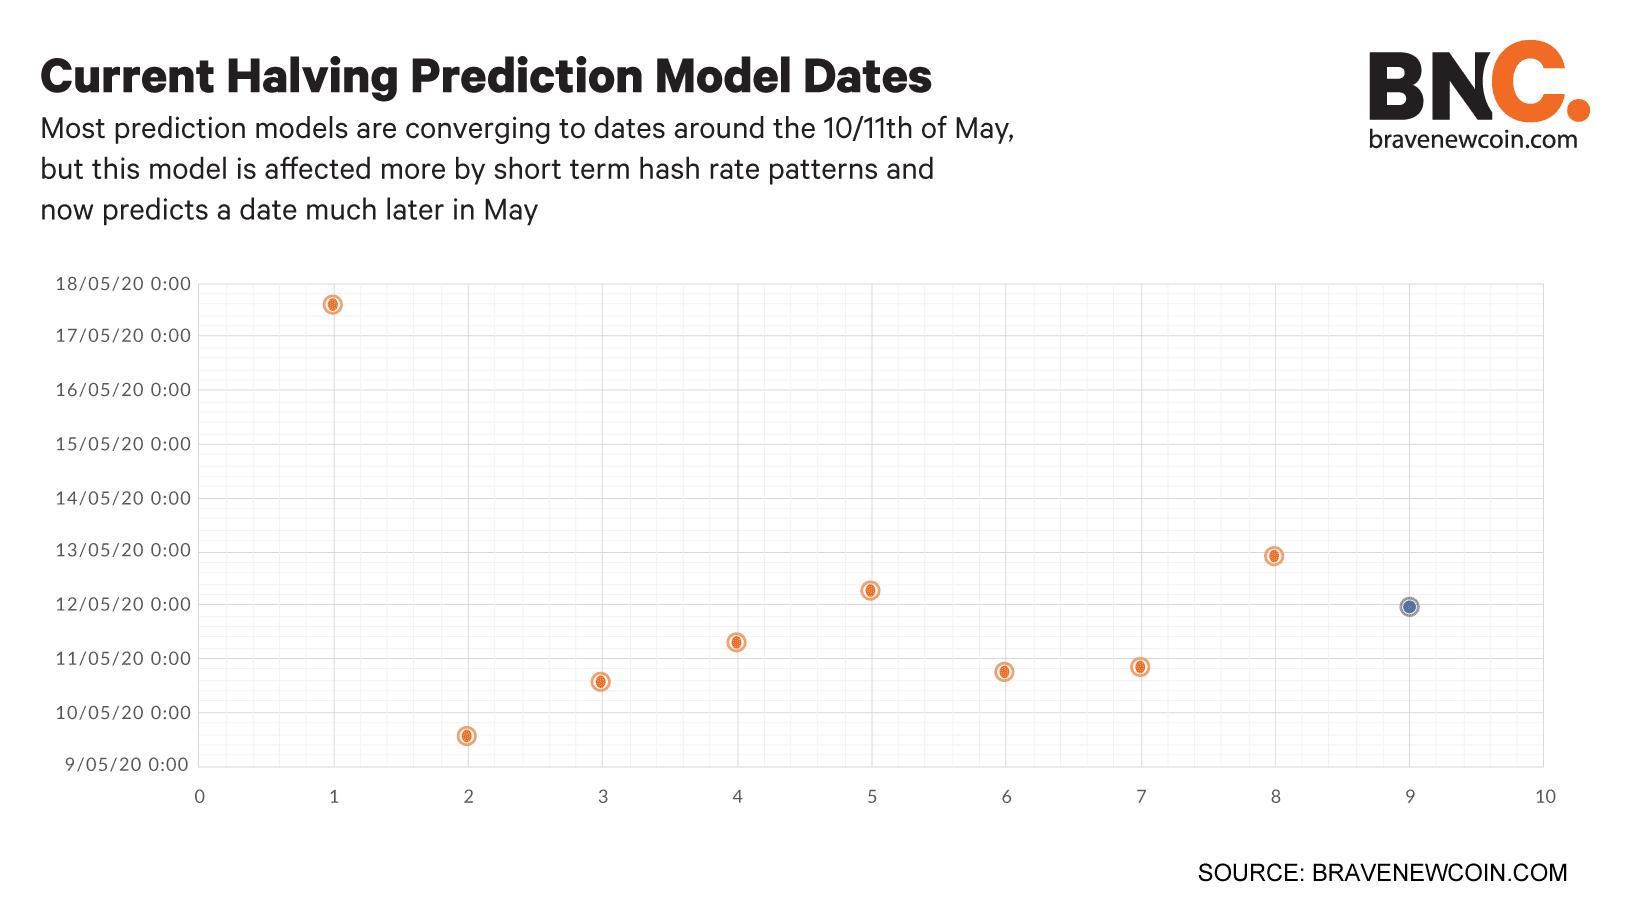 Current-halving-prediction-model-dates (3)